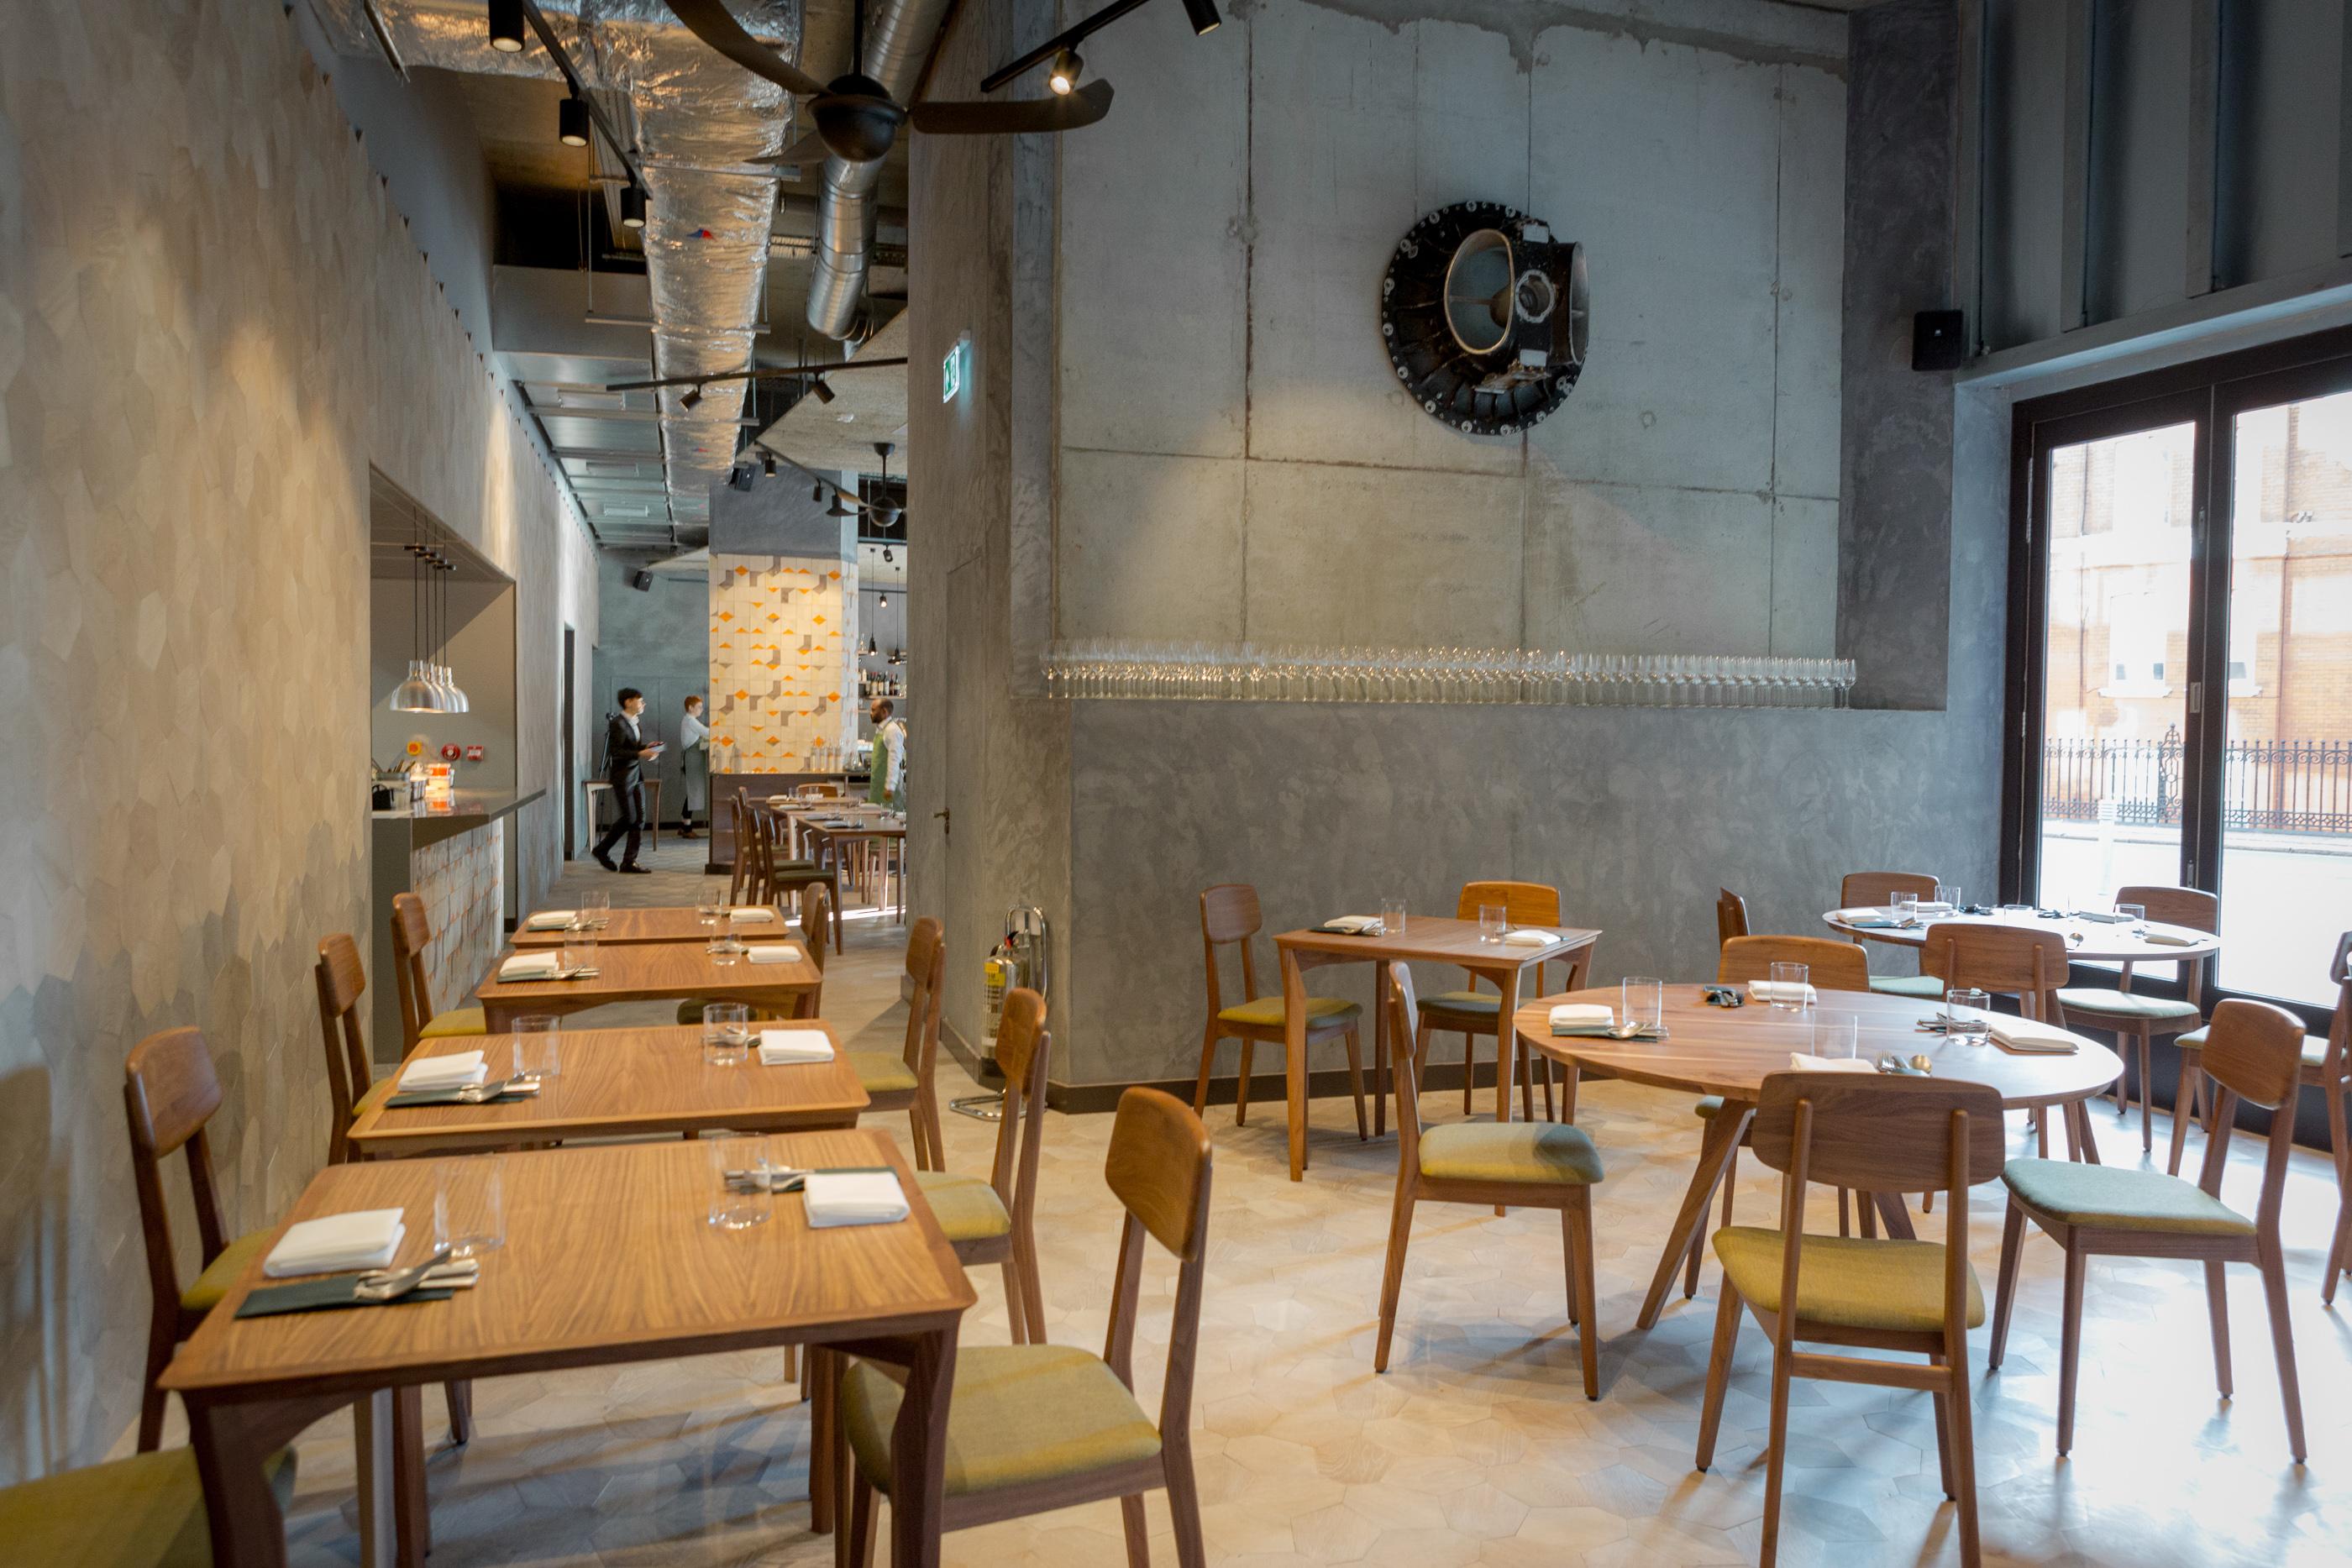 Londrino restaurant in Bermondsey by Leandro Carreira will close in London